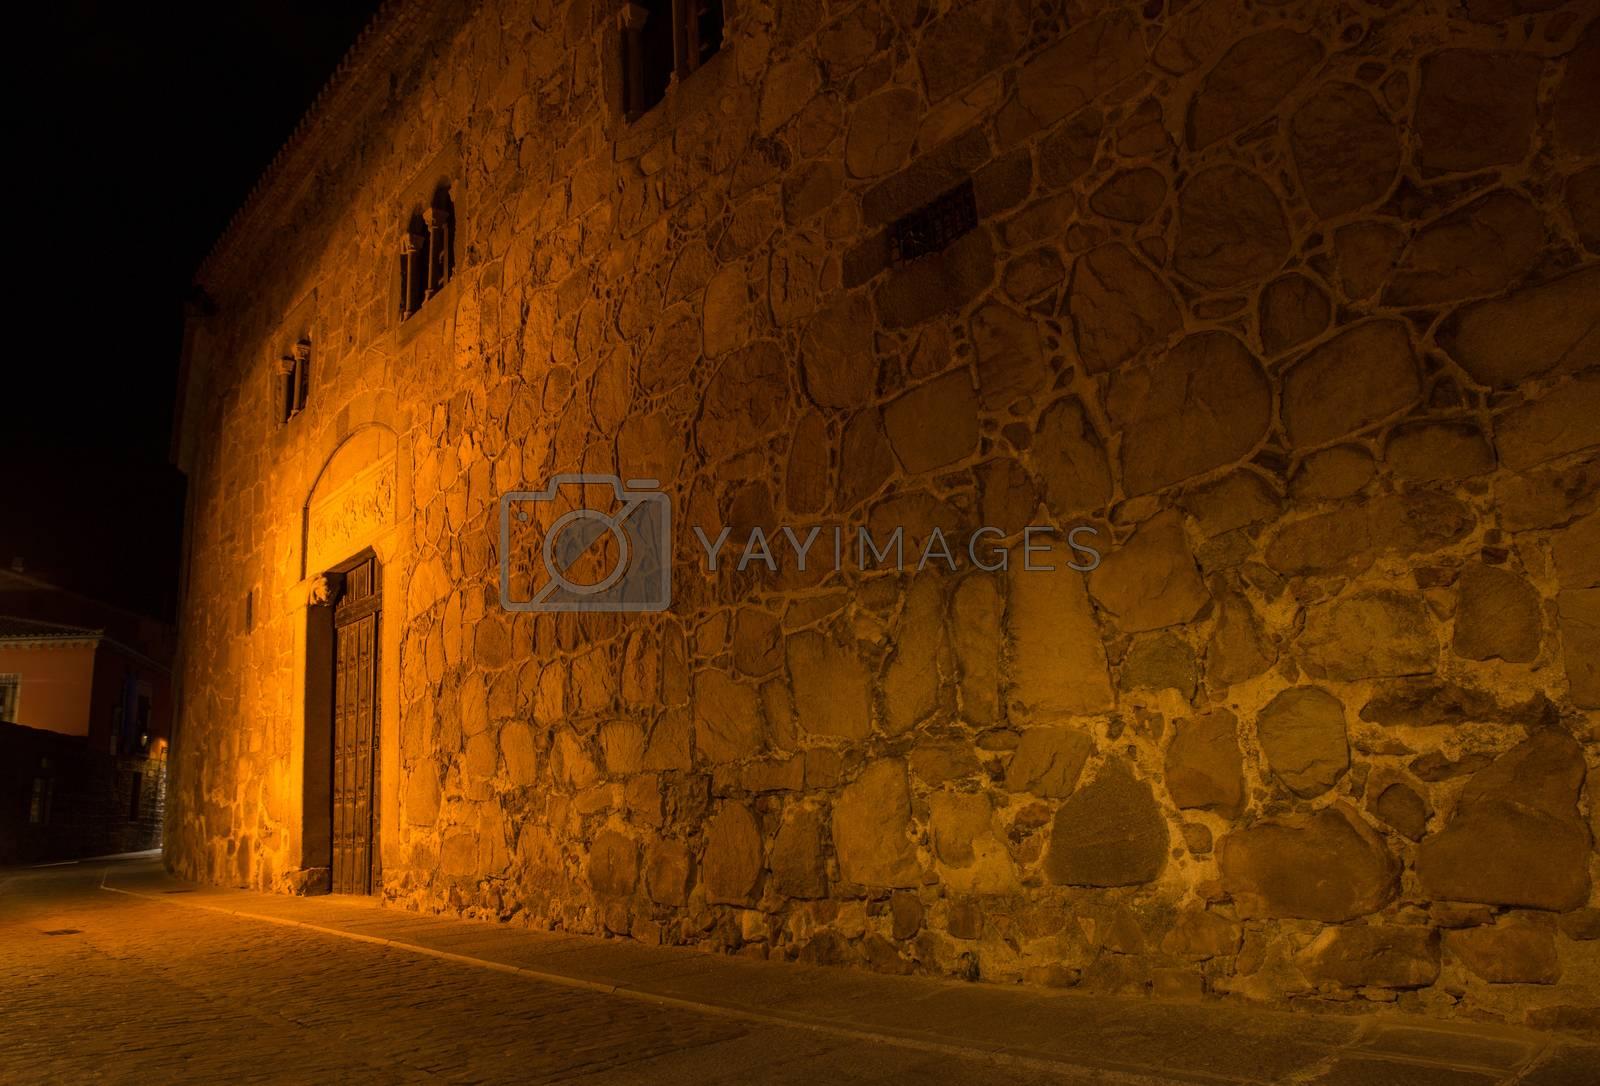 AVILA, SPAIN - Avila streets at night, Castile and Leon, Spain